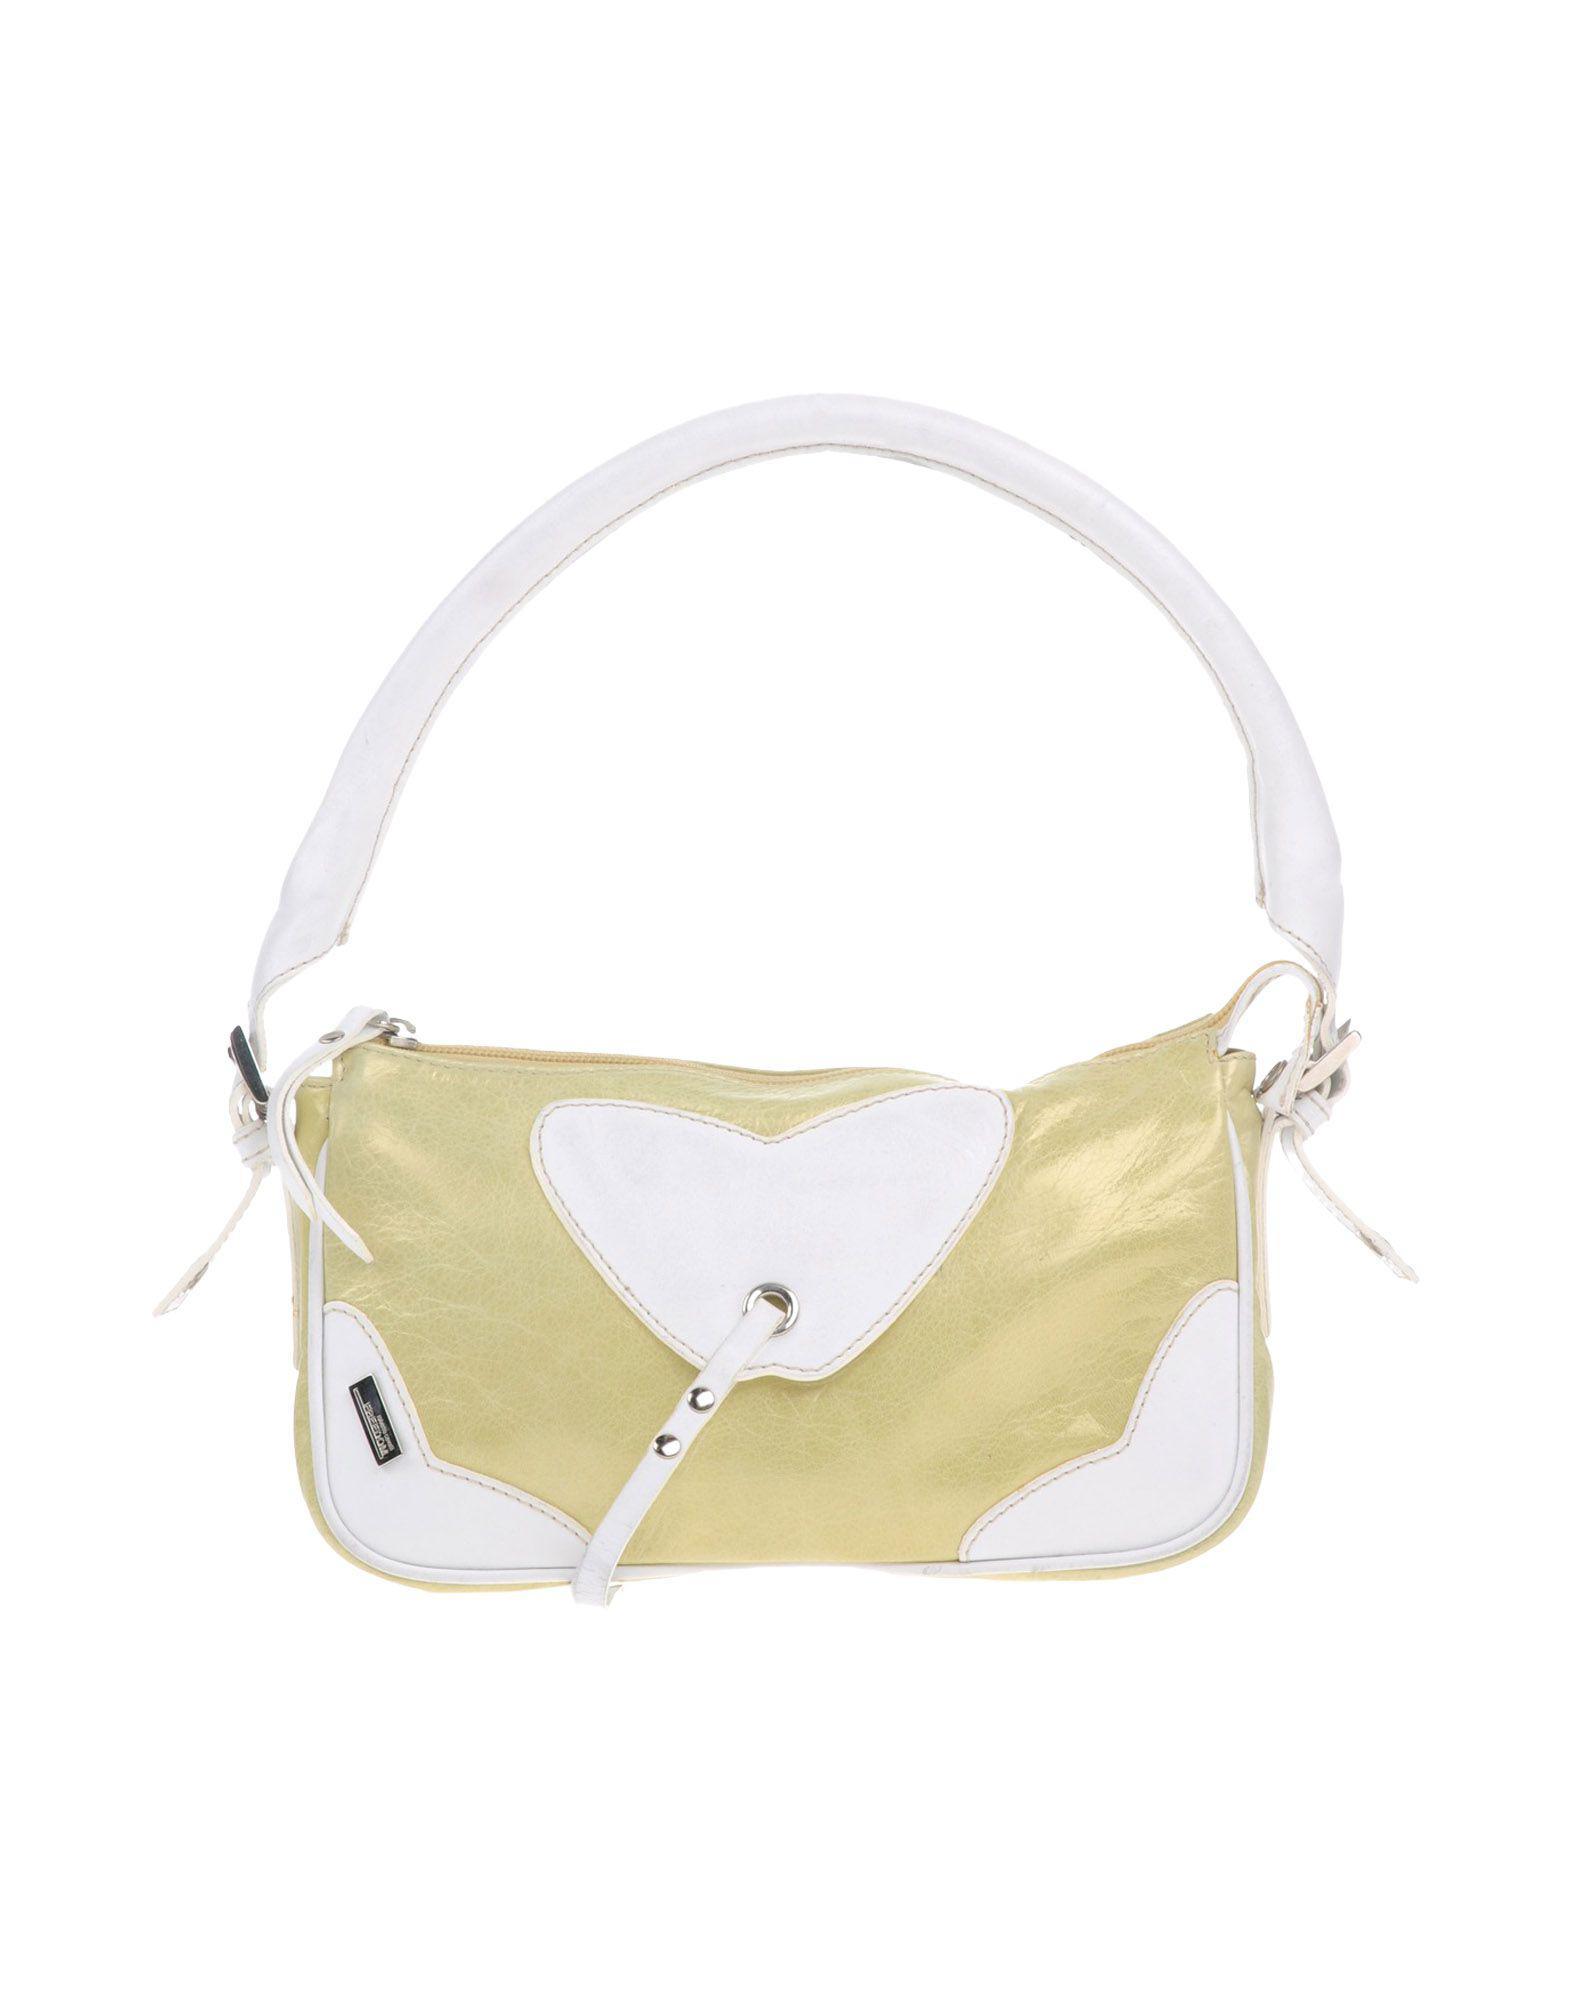 53b3610b26a9 Lyst - Raf Simons Handbags in Yellow